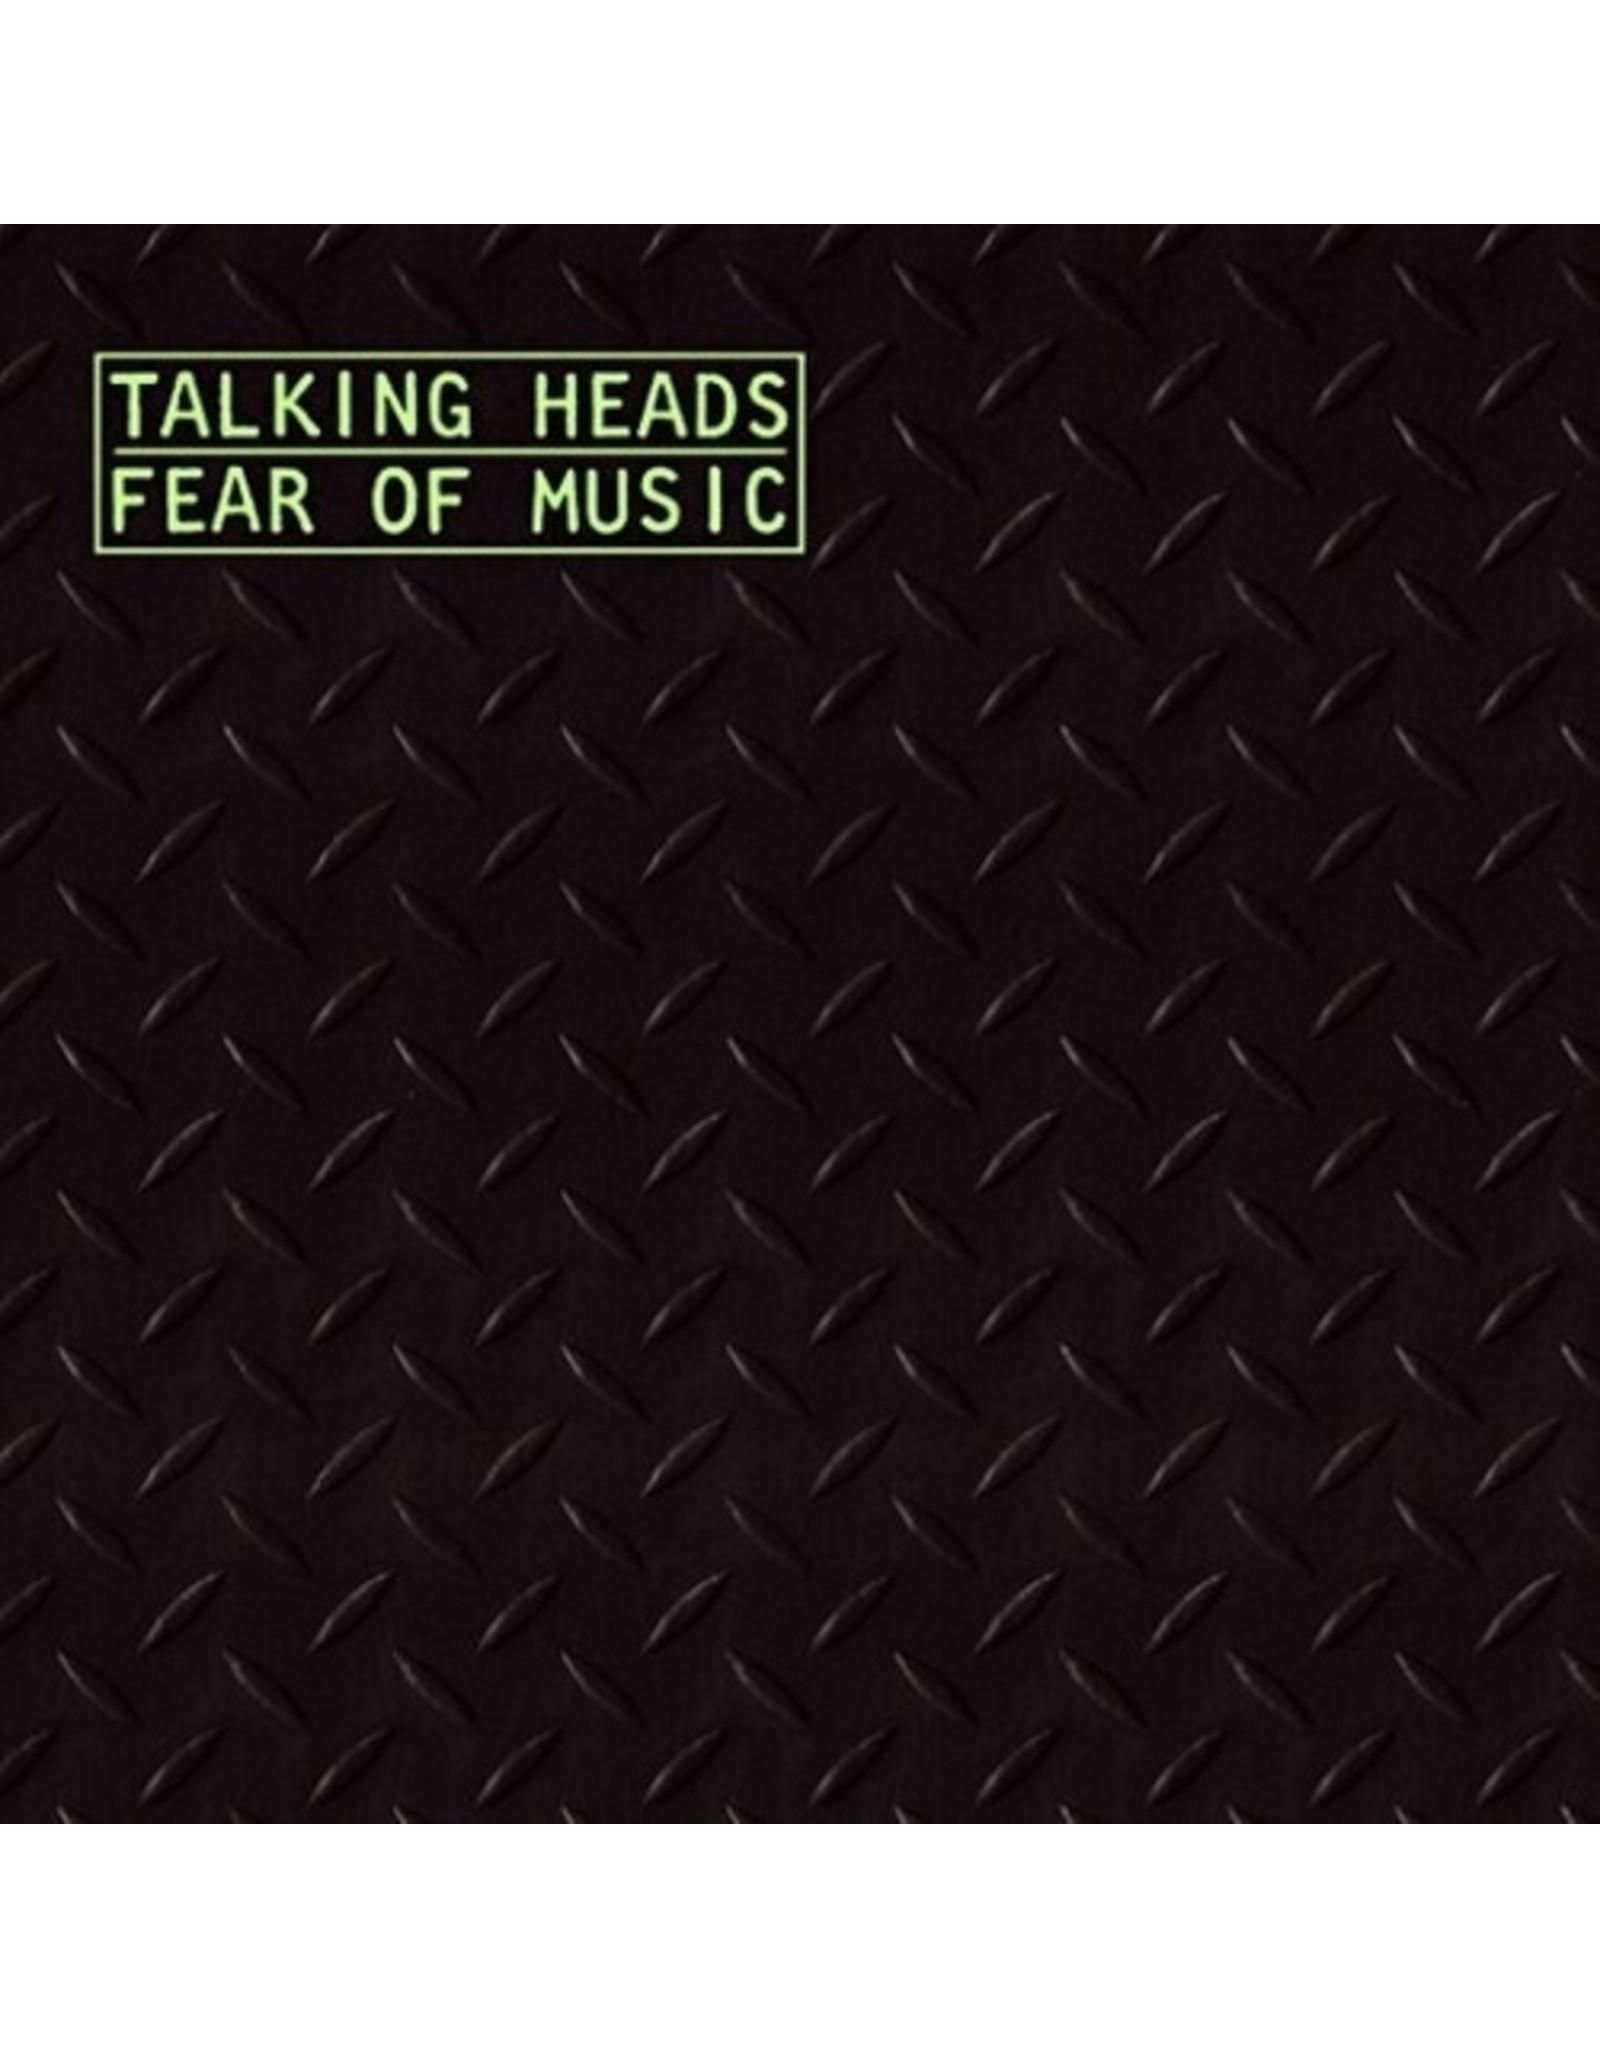 New Vinyl Talking Heads - Fear Of Music LP